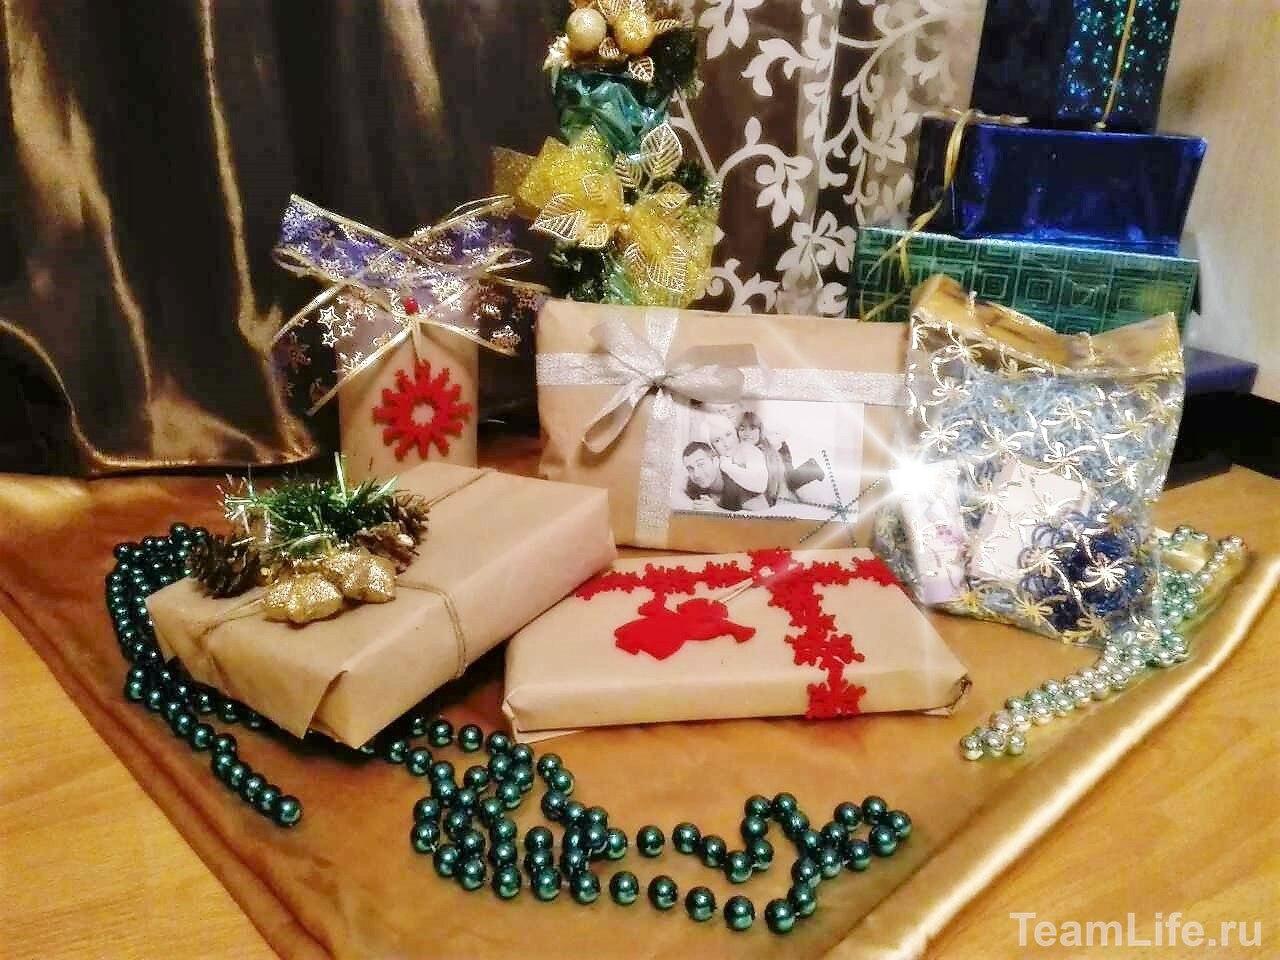 Подарки 2017